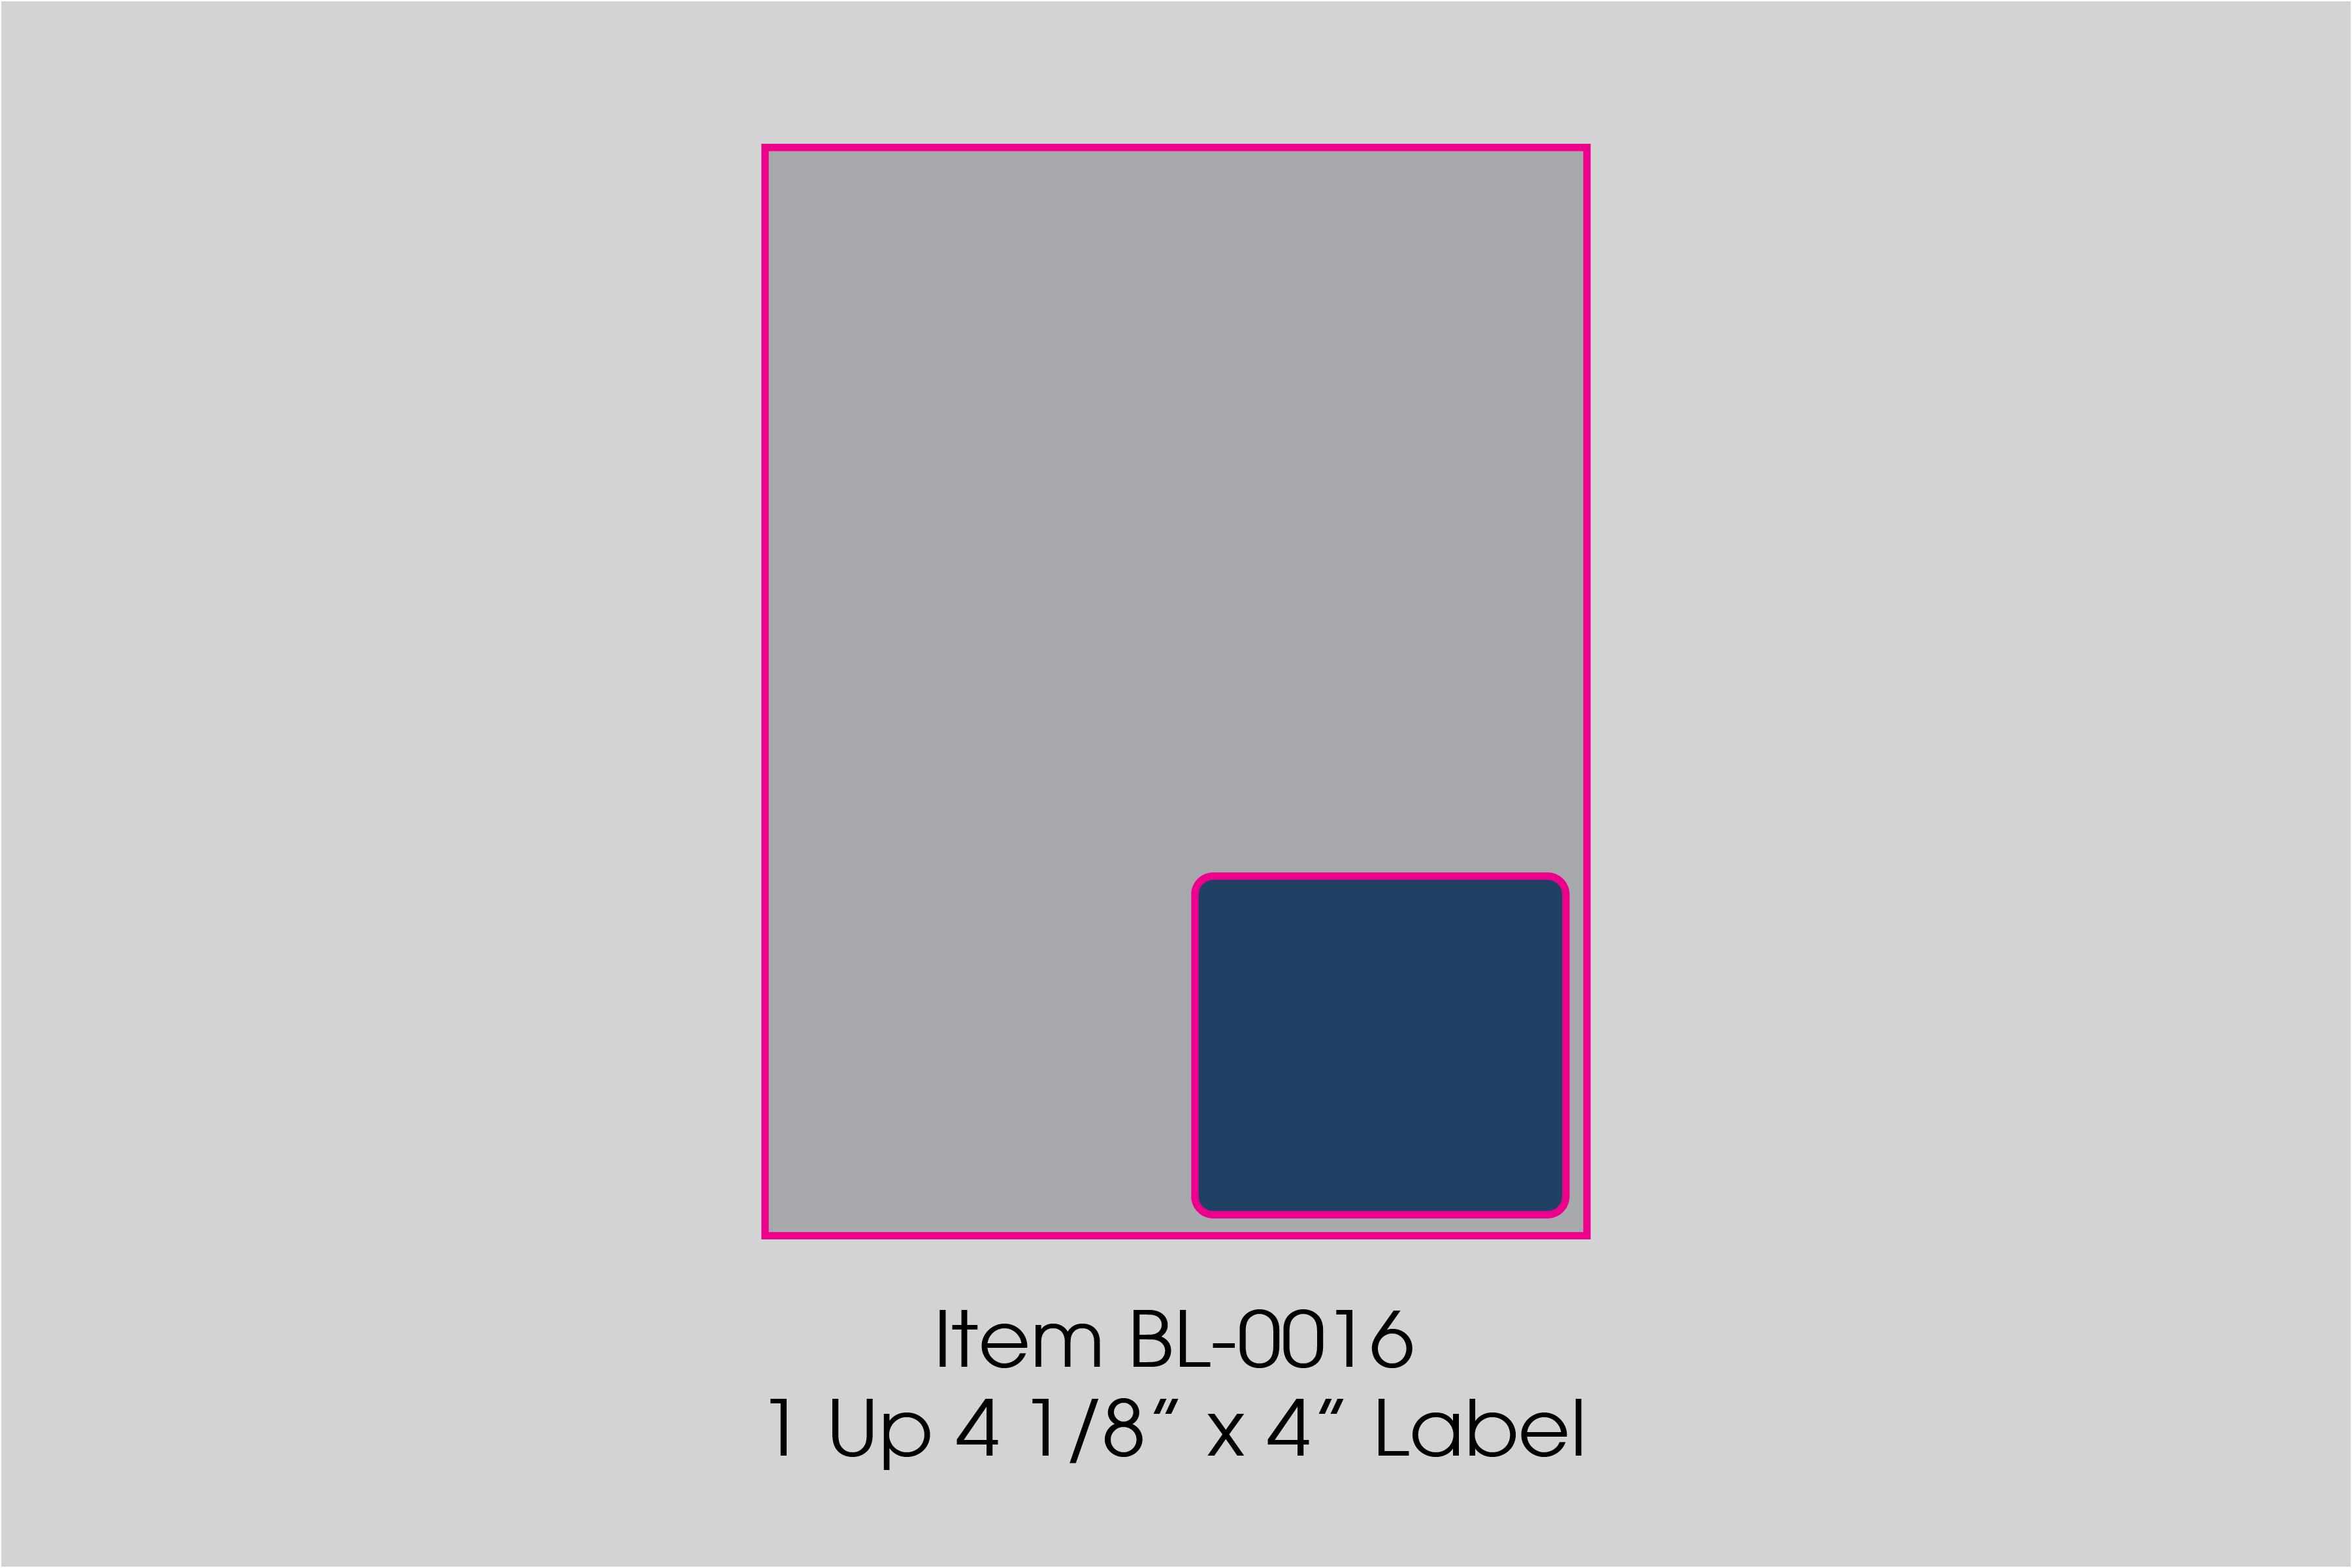 Bl-0016